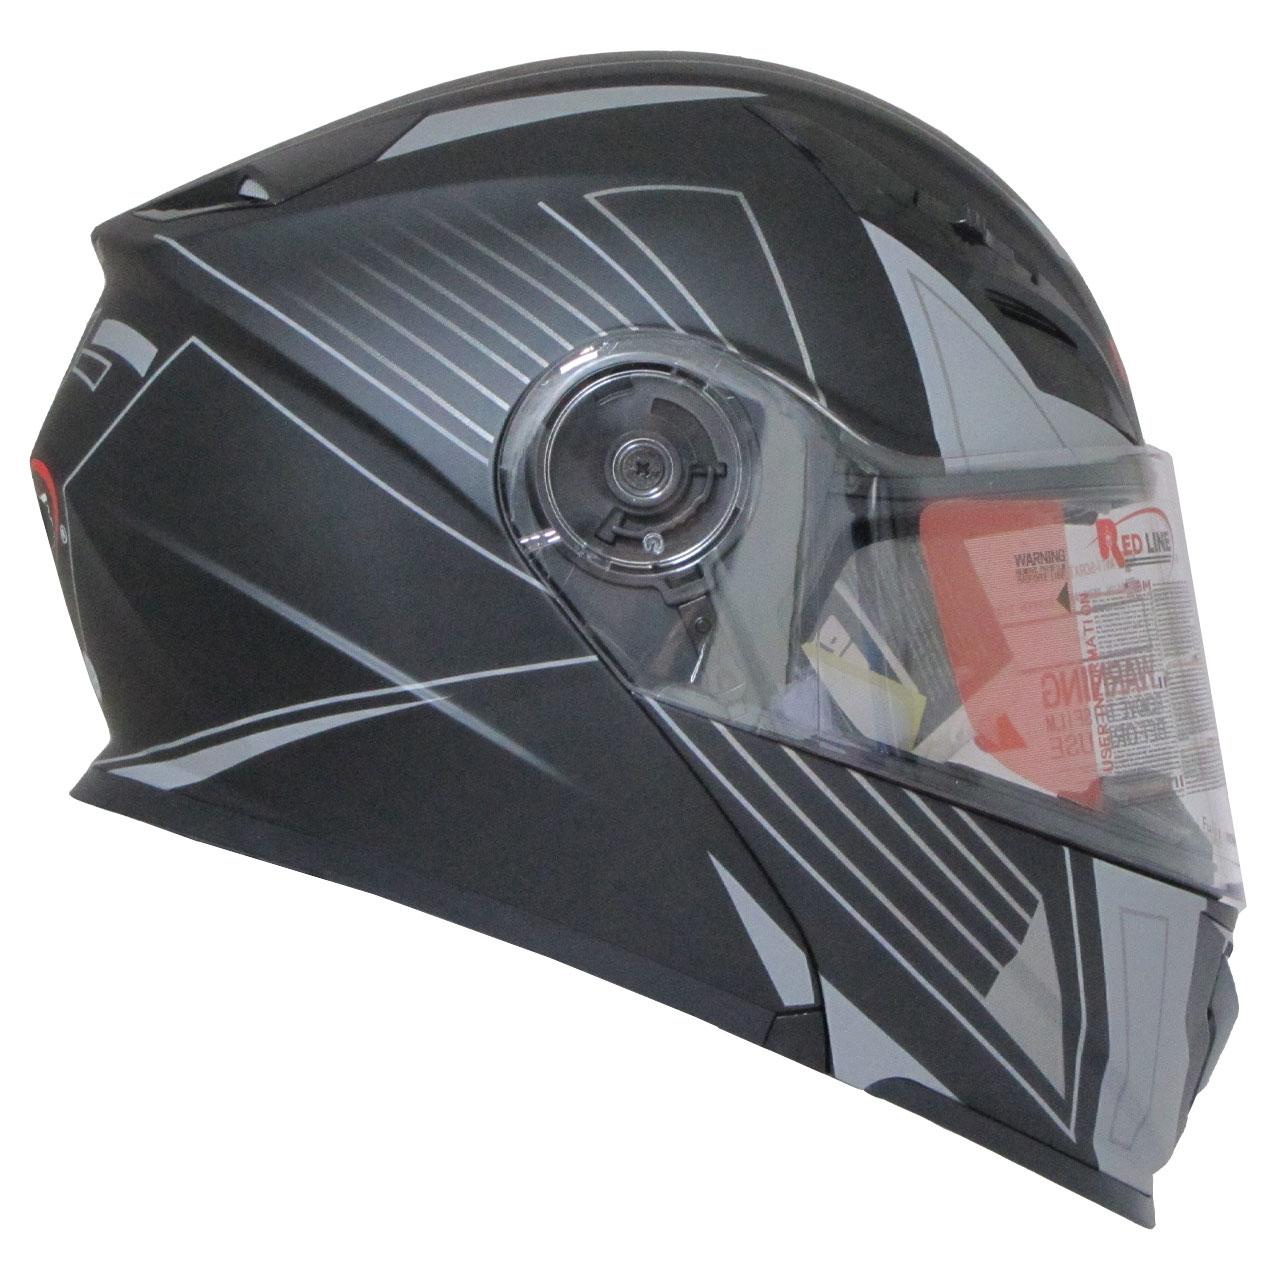 کلاه کاسکت ردلاین مدل NSN20-BLKGRY